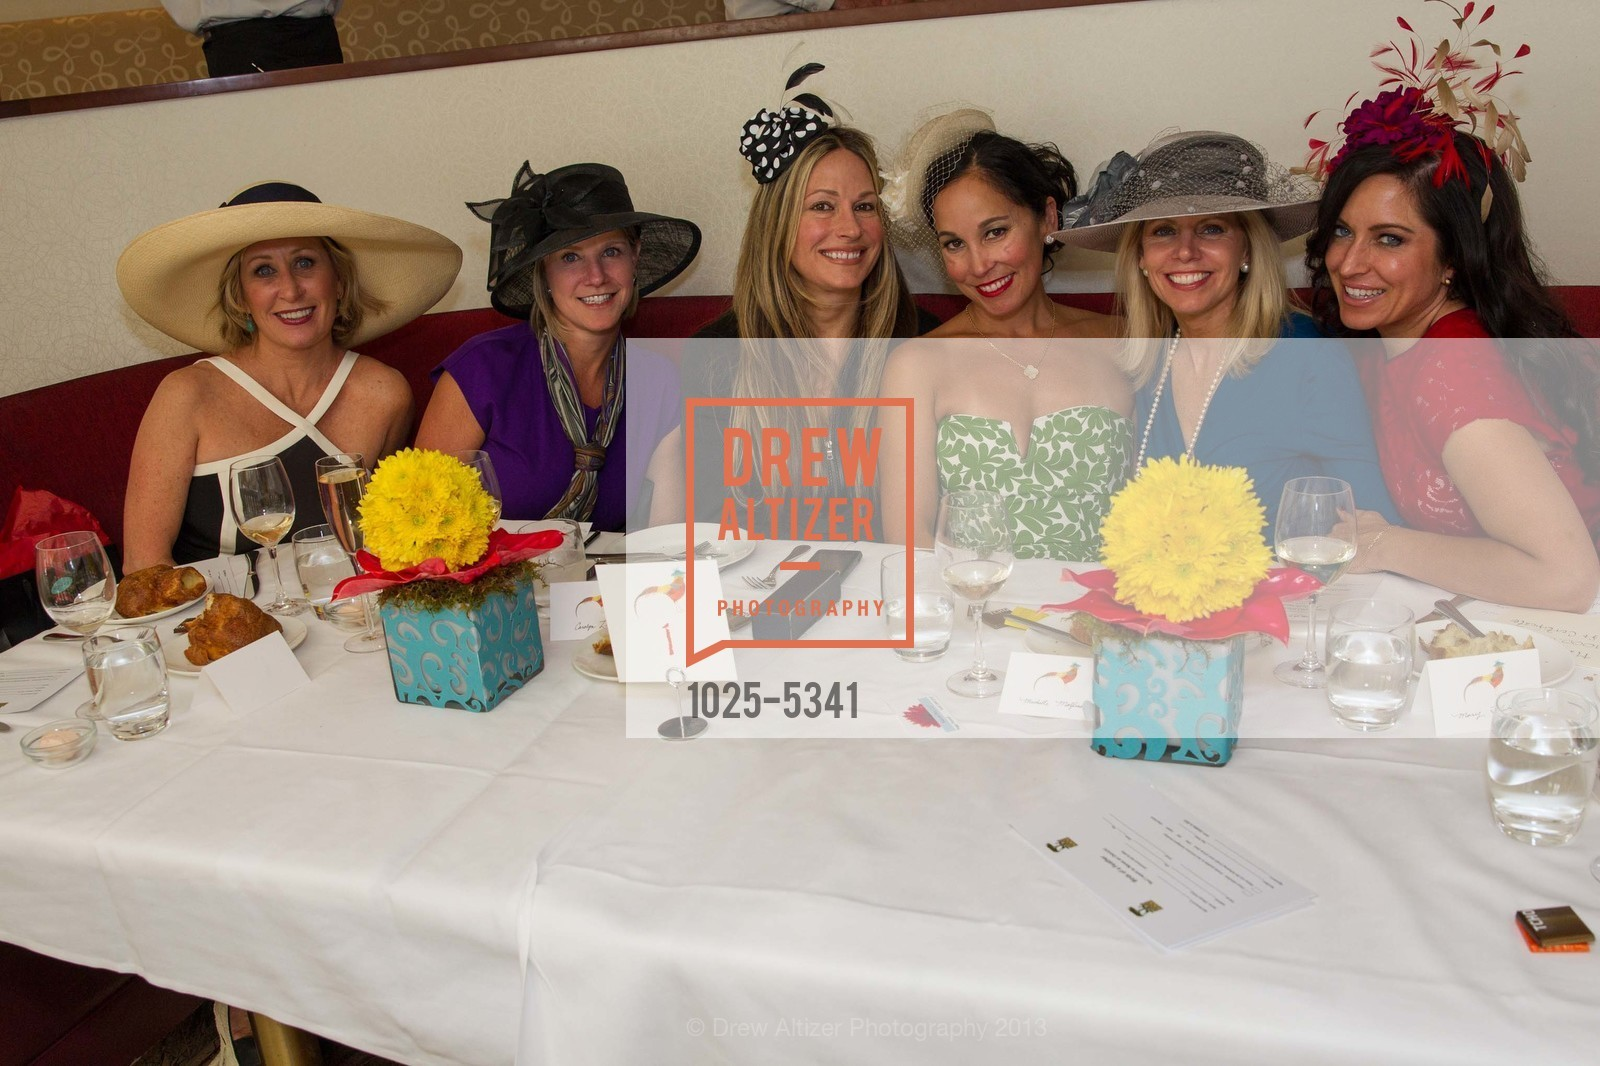 Lisa Keith, Carol Ann Weiss, Carolyne Zinko, Michelle Molfino, Corey Hyde, Photo #1025-5341